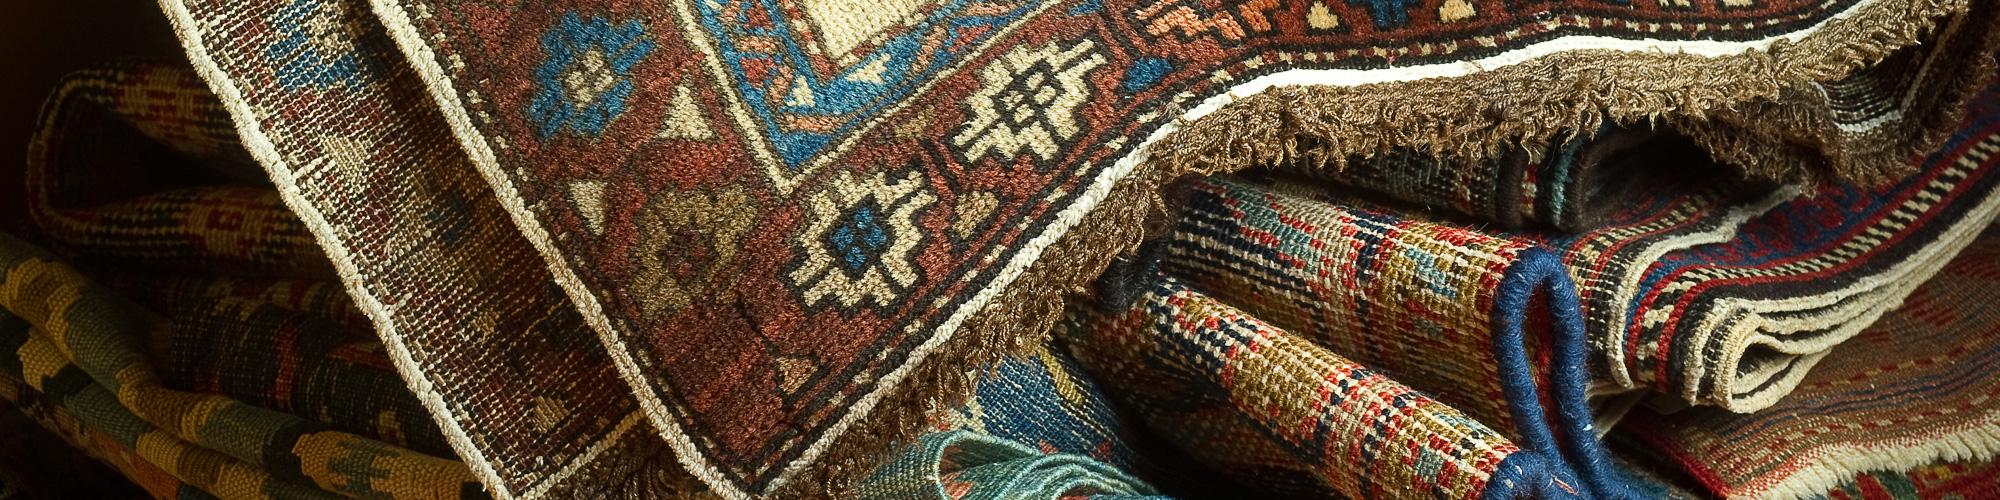 Carpet Solution is cape cods local